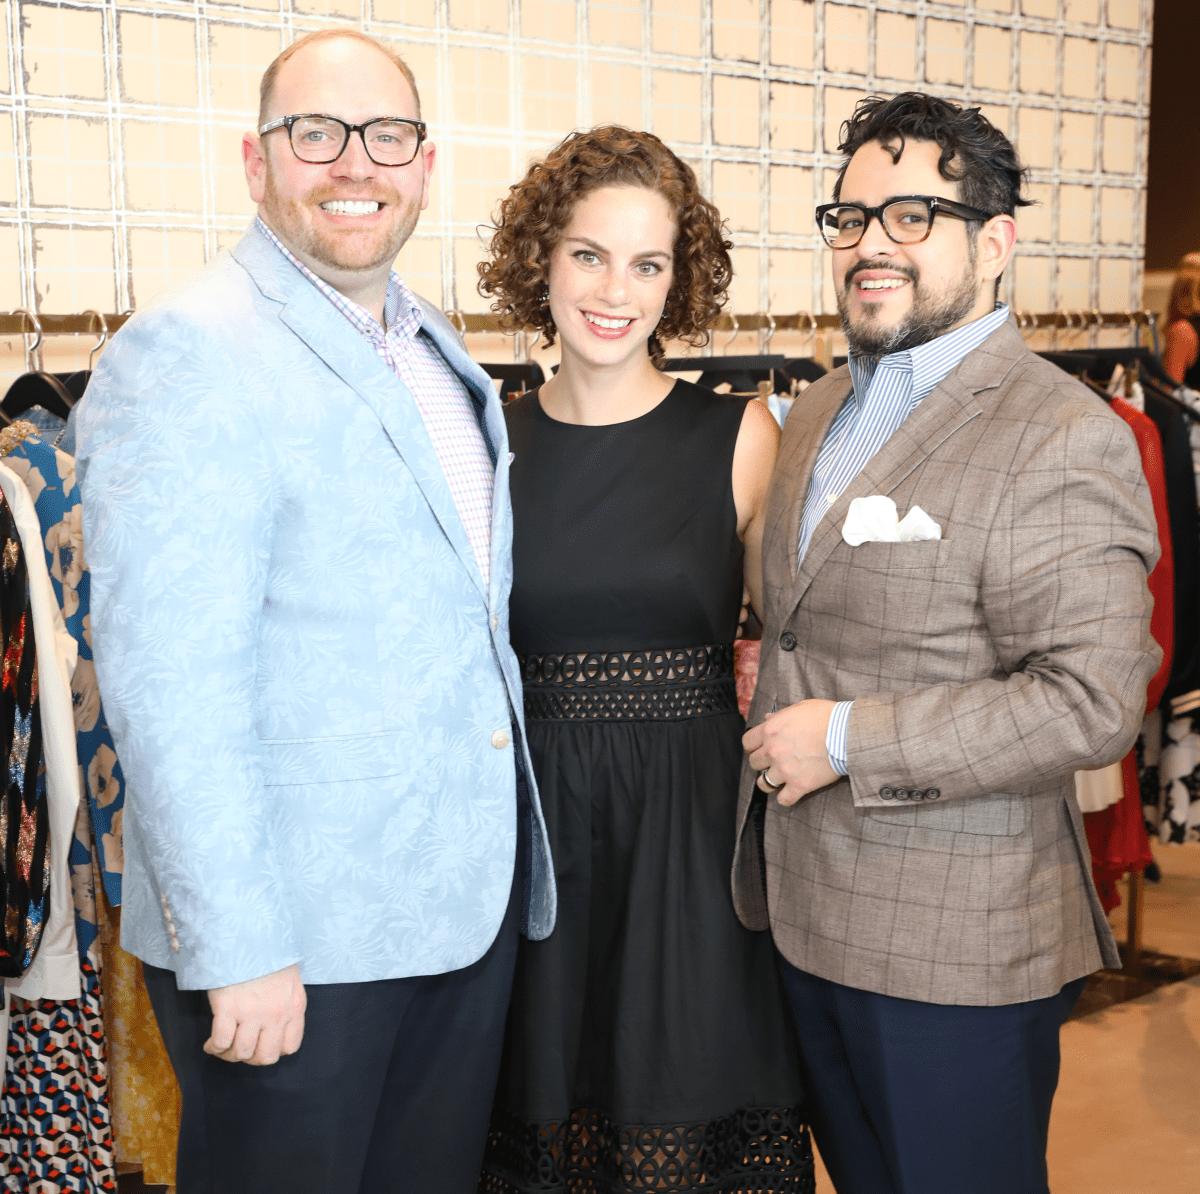 Darrin Davis, Emily Schrieber, Mario Emundsson at Houston Grand Opera party at The Webster